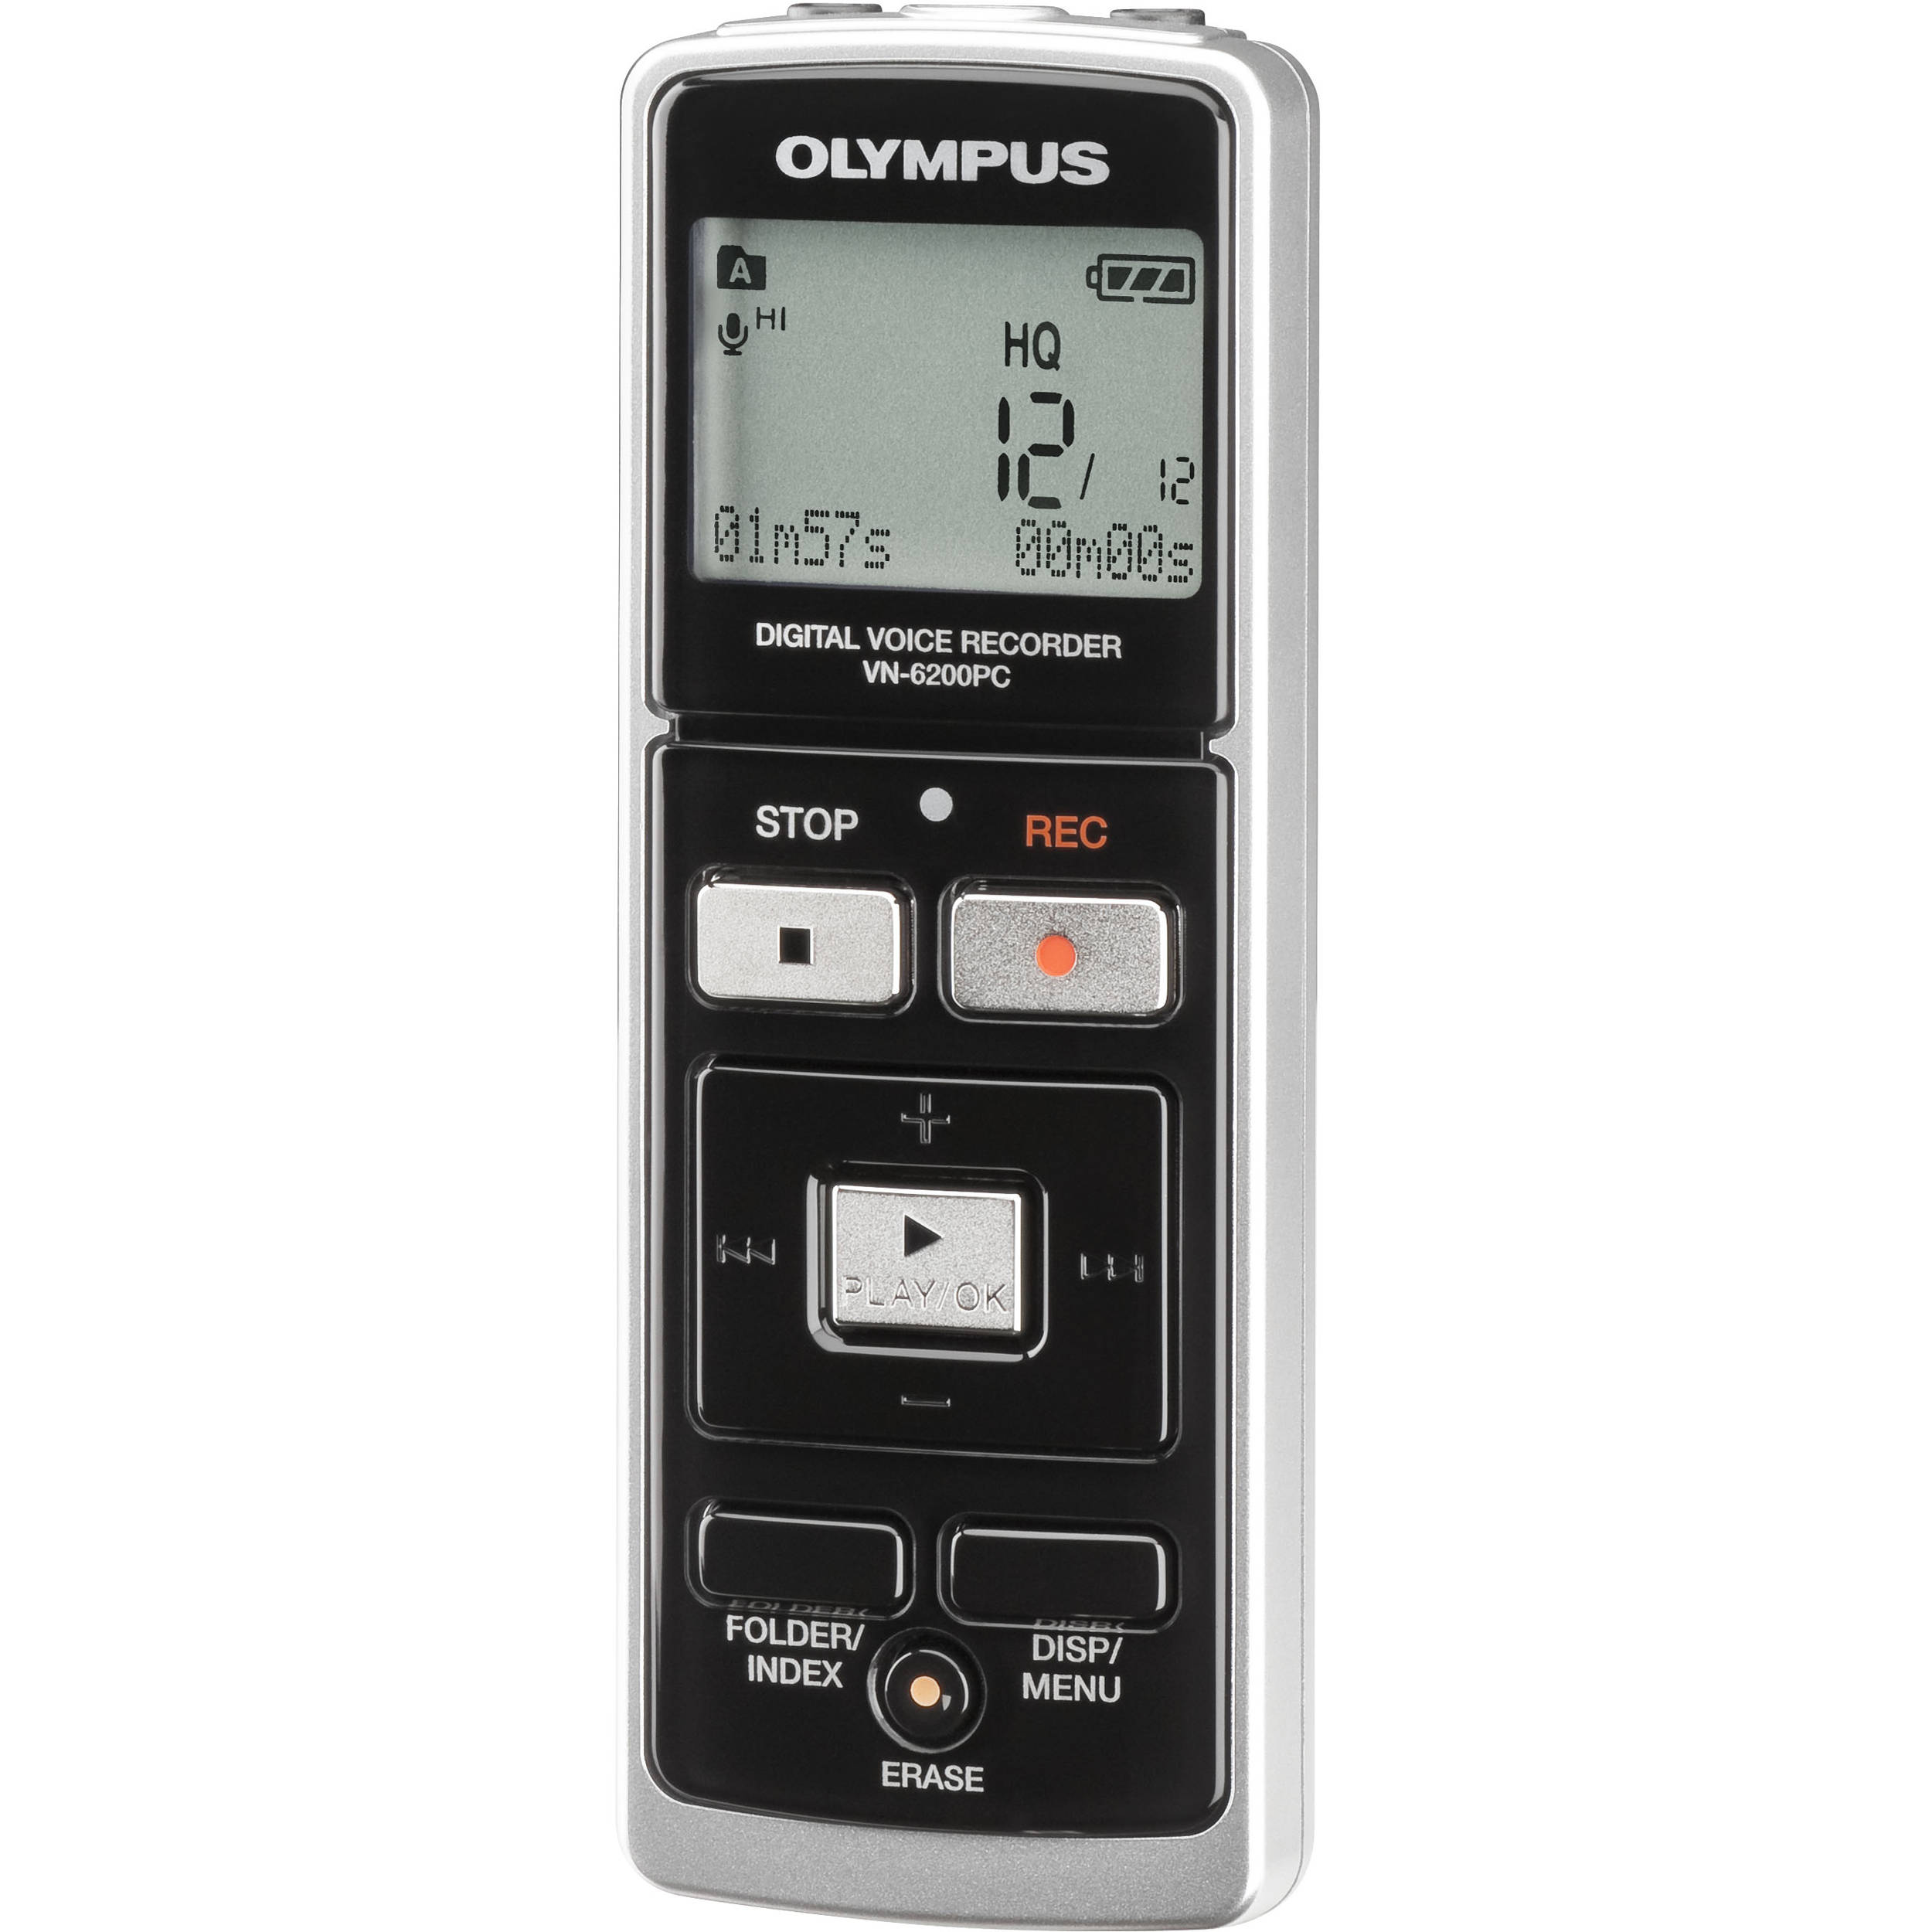 olympus vn 6200pc digital voice recorder 1gb 142070 b h photo rh bhphotovideo com Olympus Voice Recorder VN- 7200 digital voice recorder vn 6200pc manual